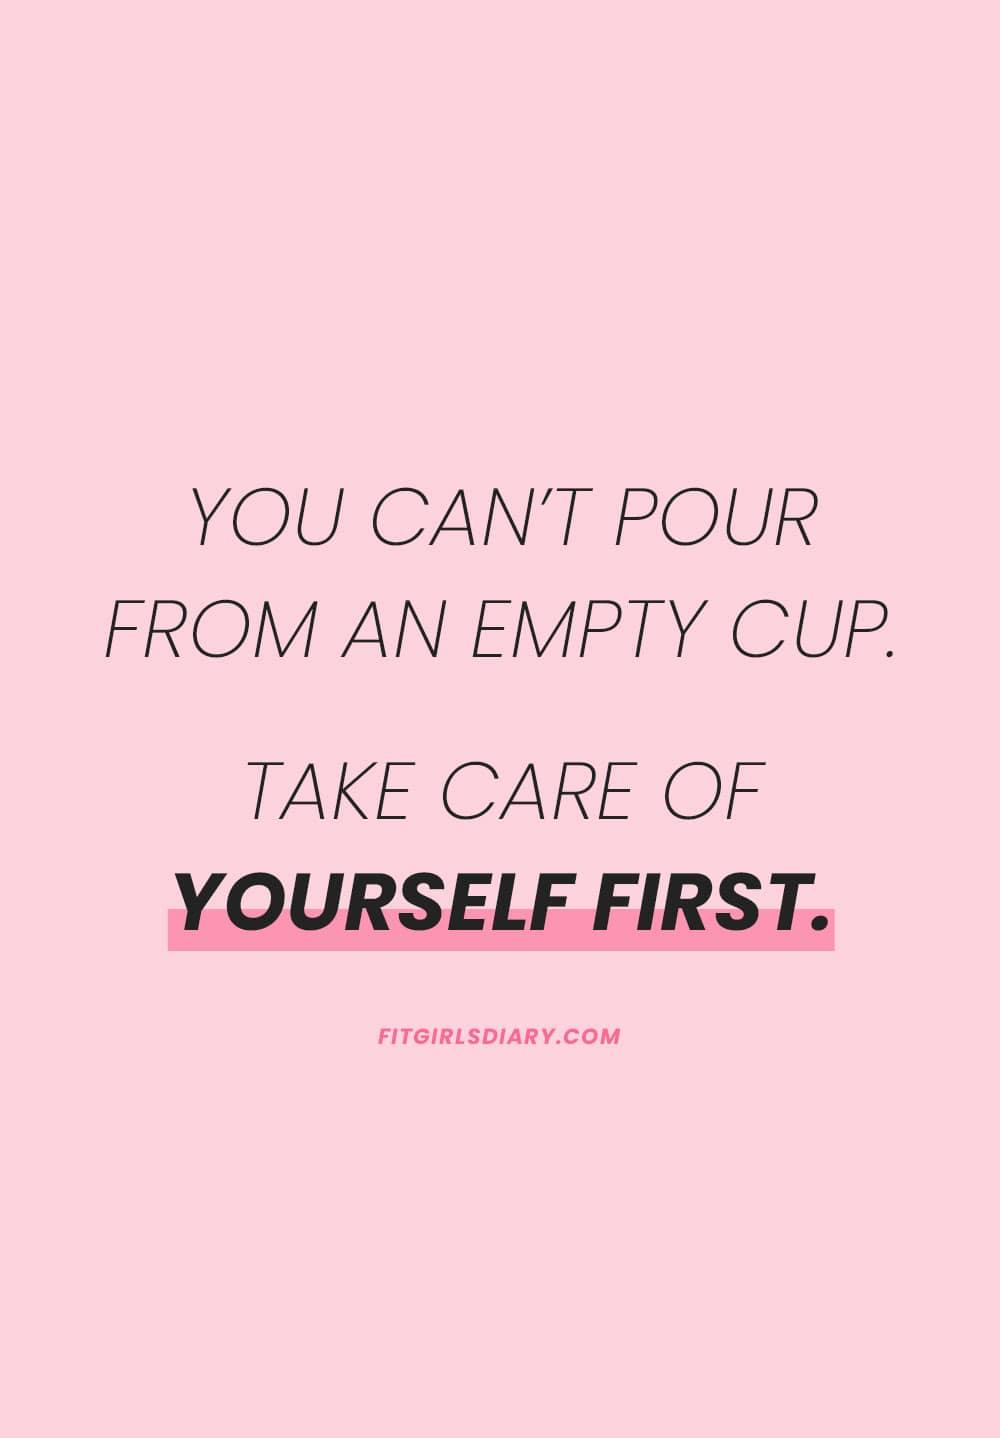 self care quotes - self care ideas